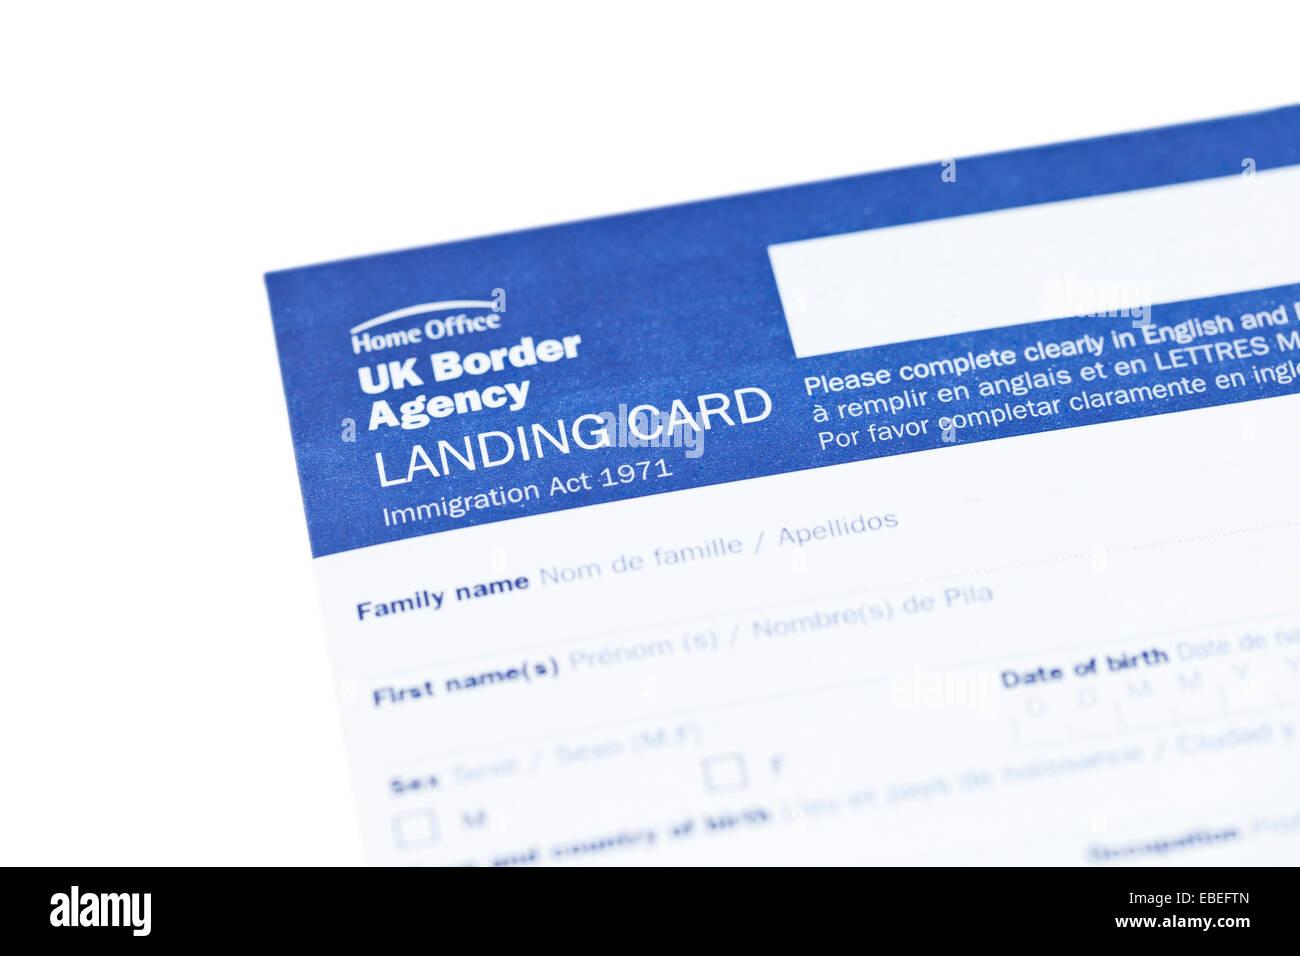 UK border agency landing card immigration form Stock Photo: 75922469 ...